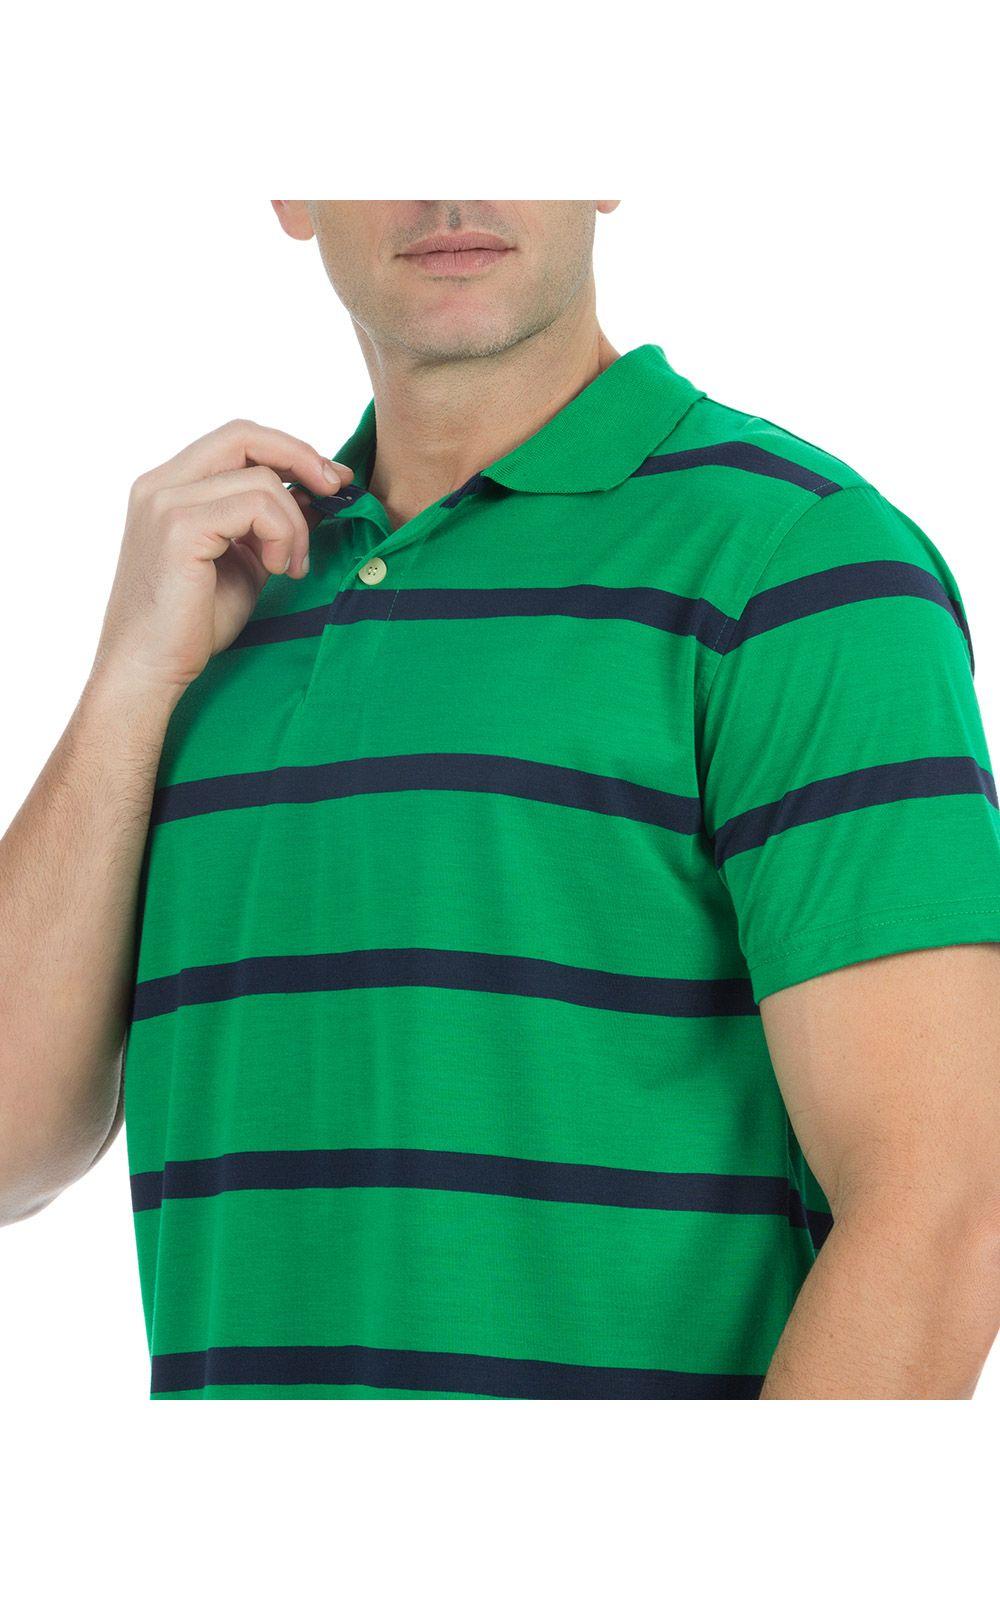 Foto 3 - Camisa Polo Masculina Verde Listrada